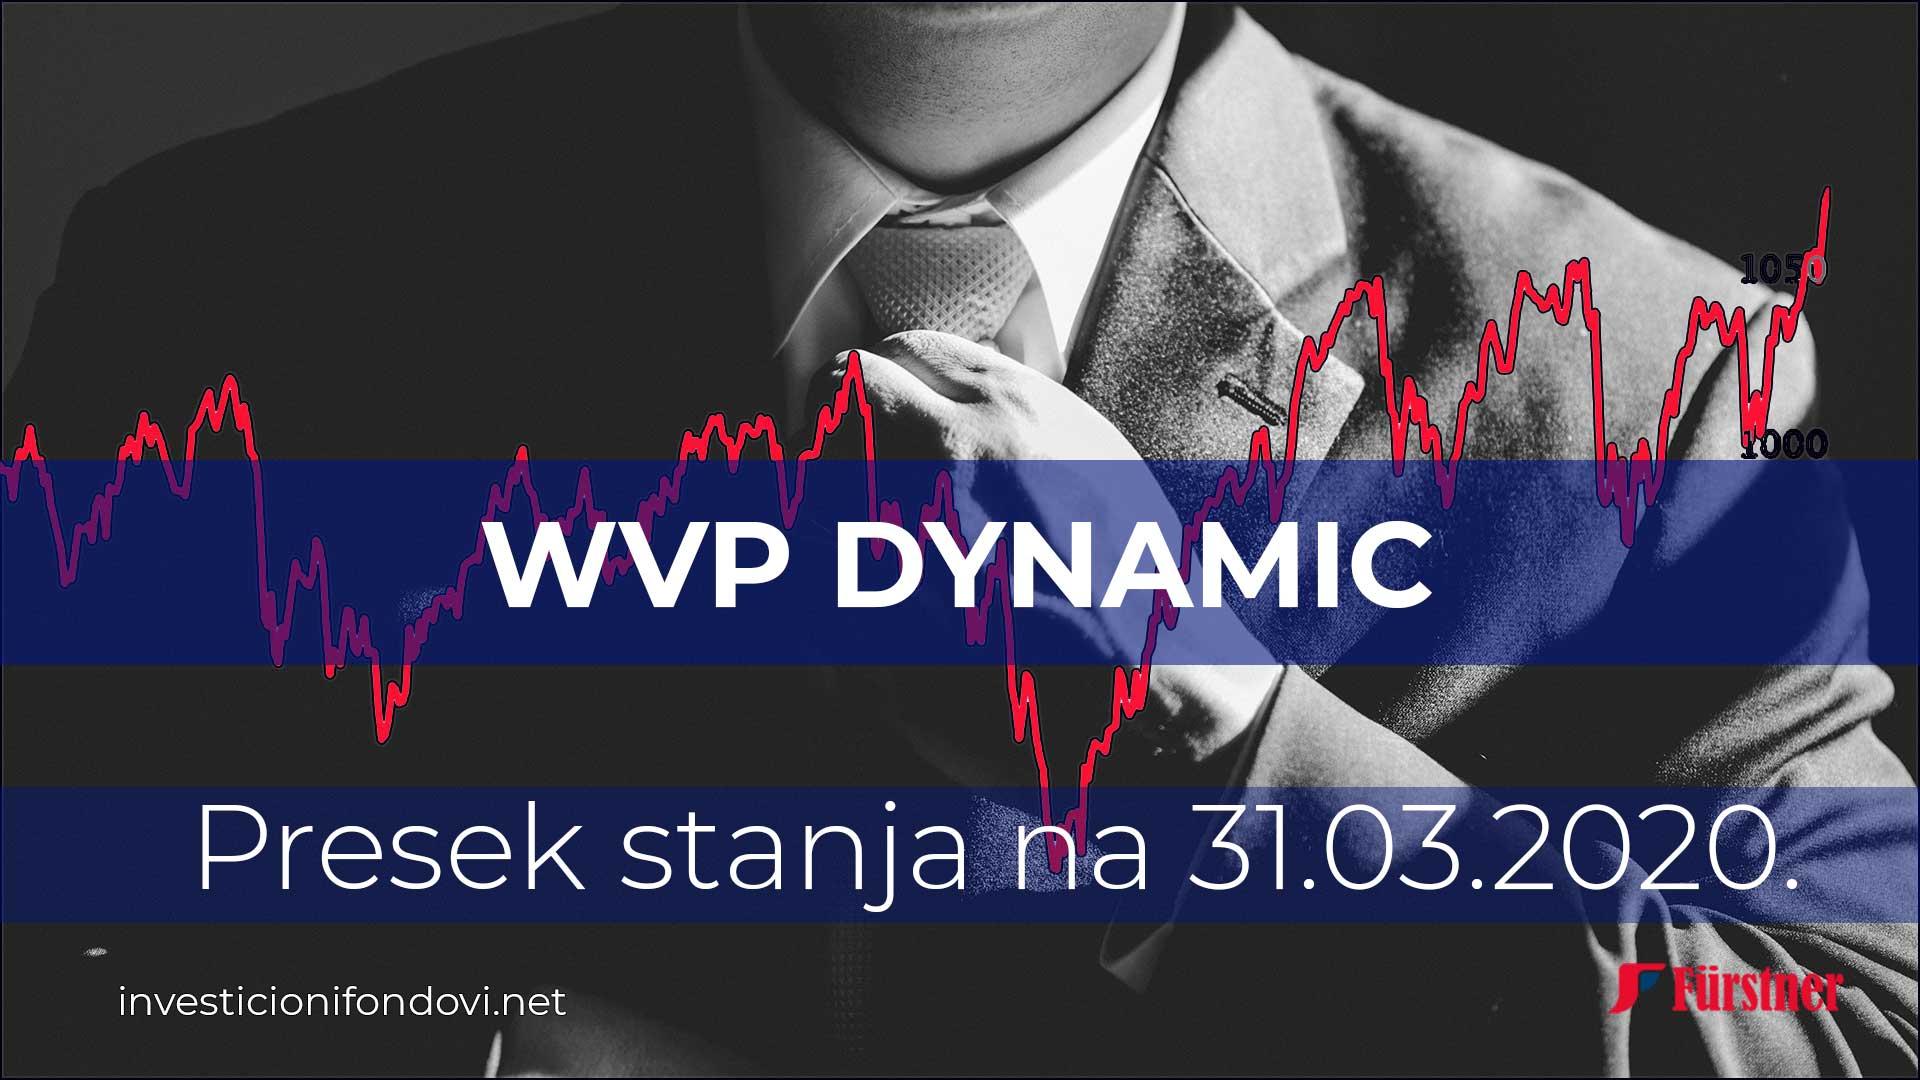 Presek stanja WVP Dynamic 31.03.2020. | Investicioni fondovi